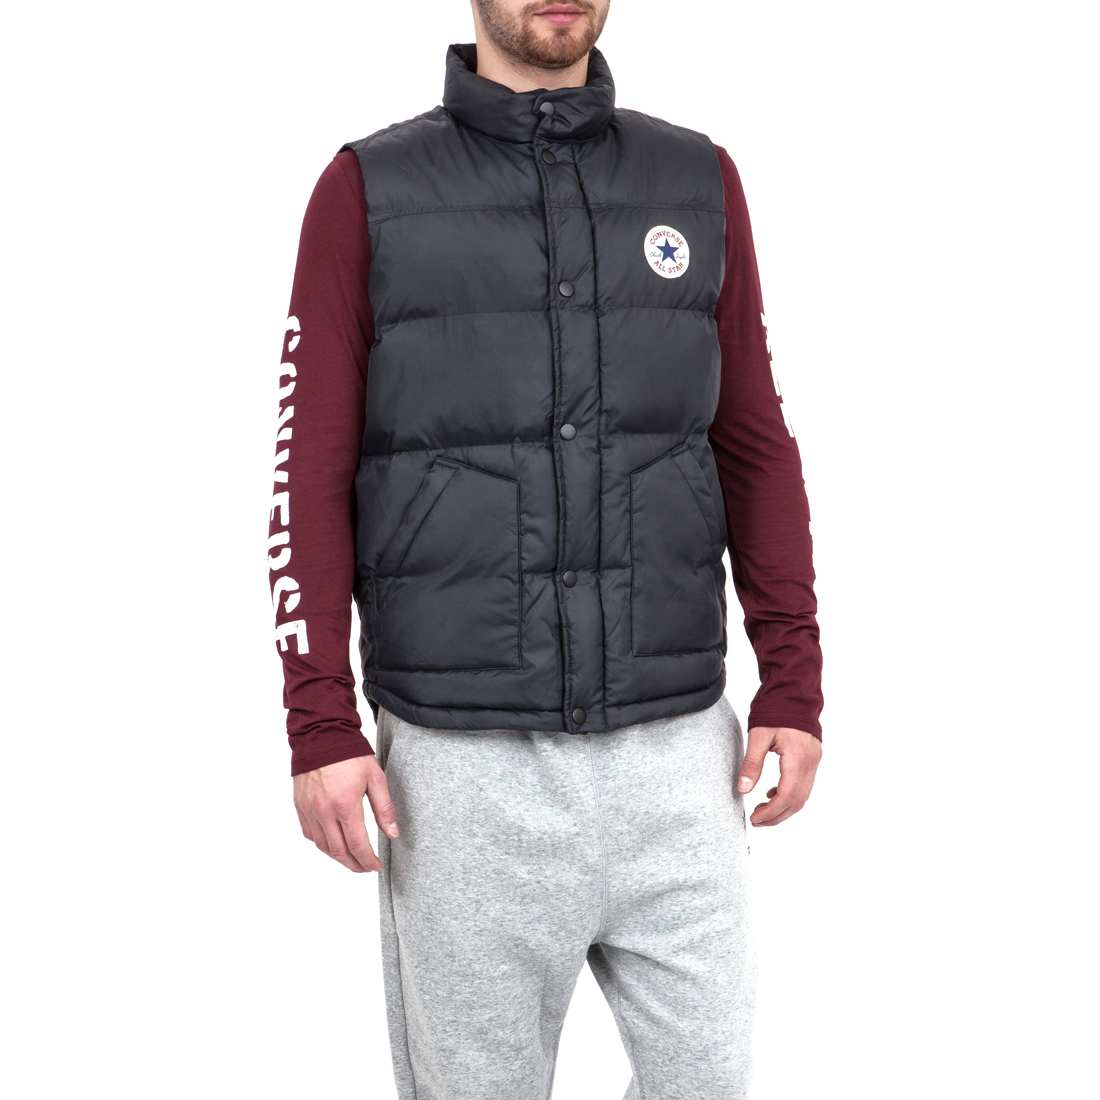 CONVERSE - Ανδρικό μπουφάν Converse μαύρο ανδρικά ρούχα πανωφόρια γιλέκα